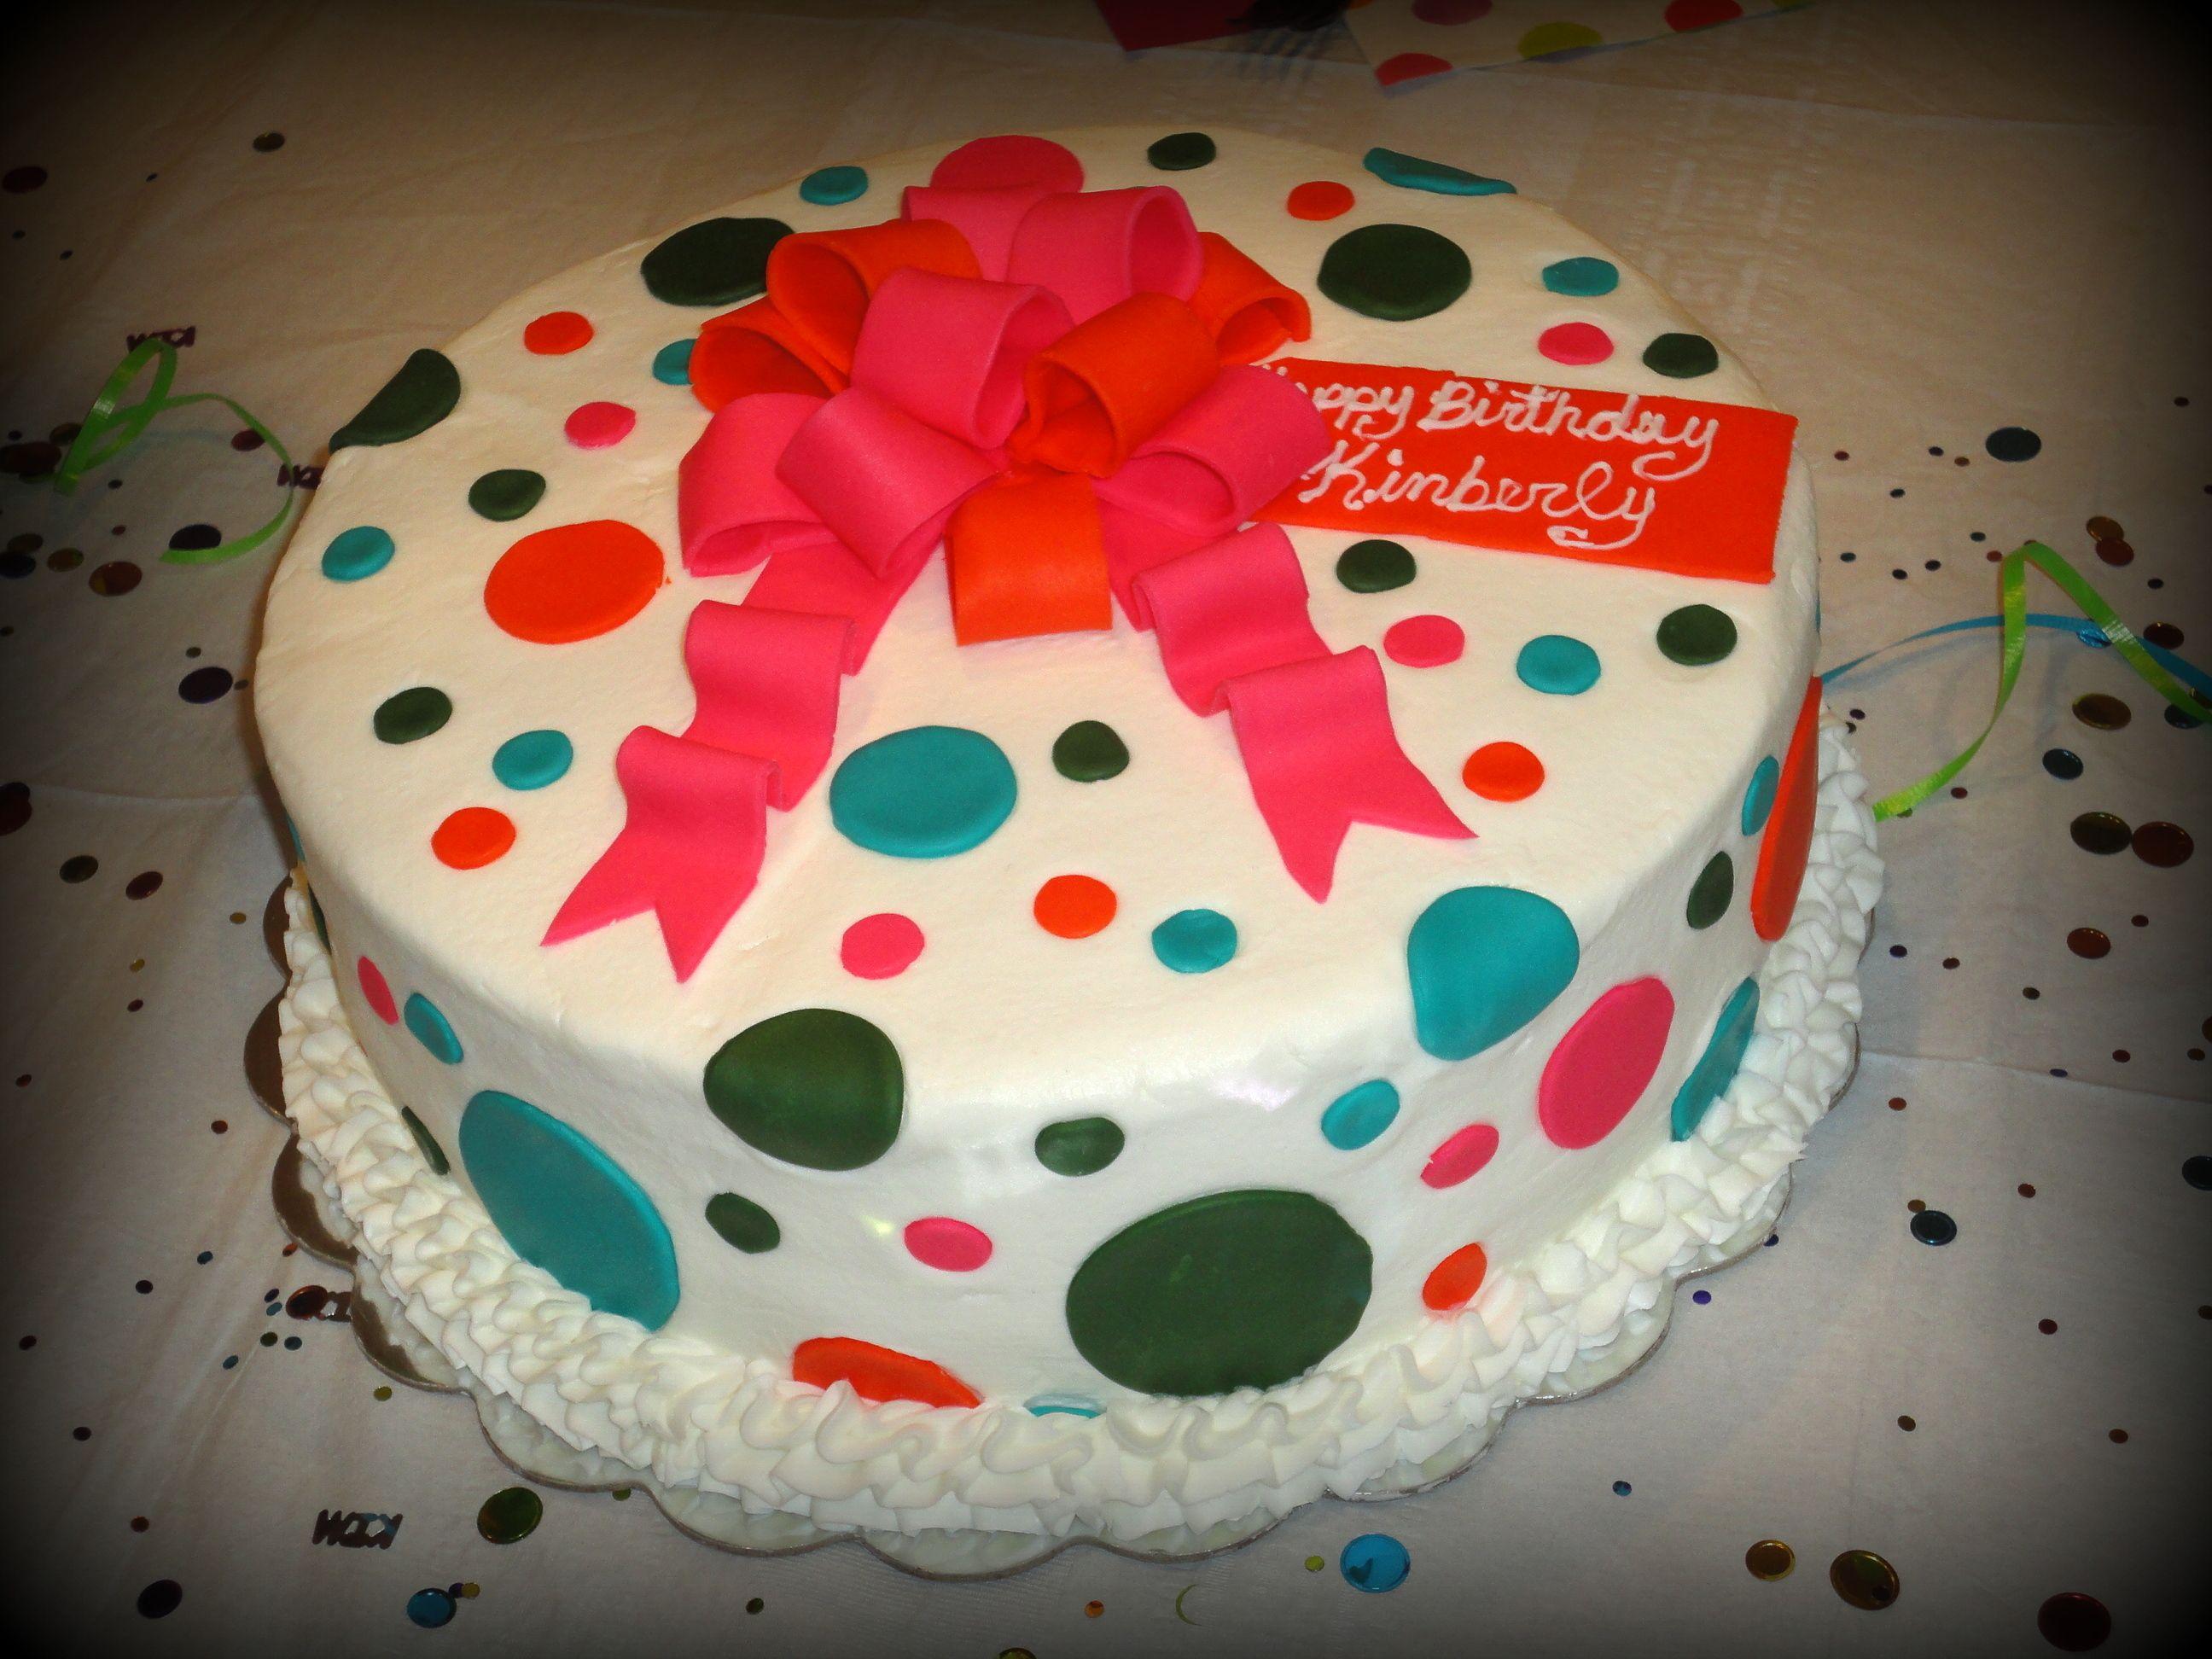 Birthday Cake With Name Tag ~ Polka dot birthday with a bow cake name tag says happy birthday